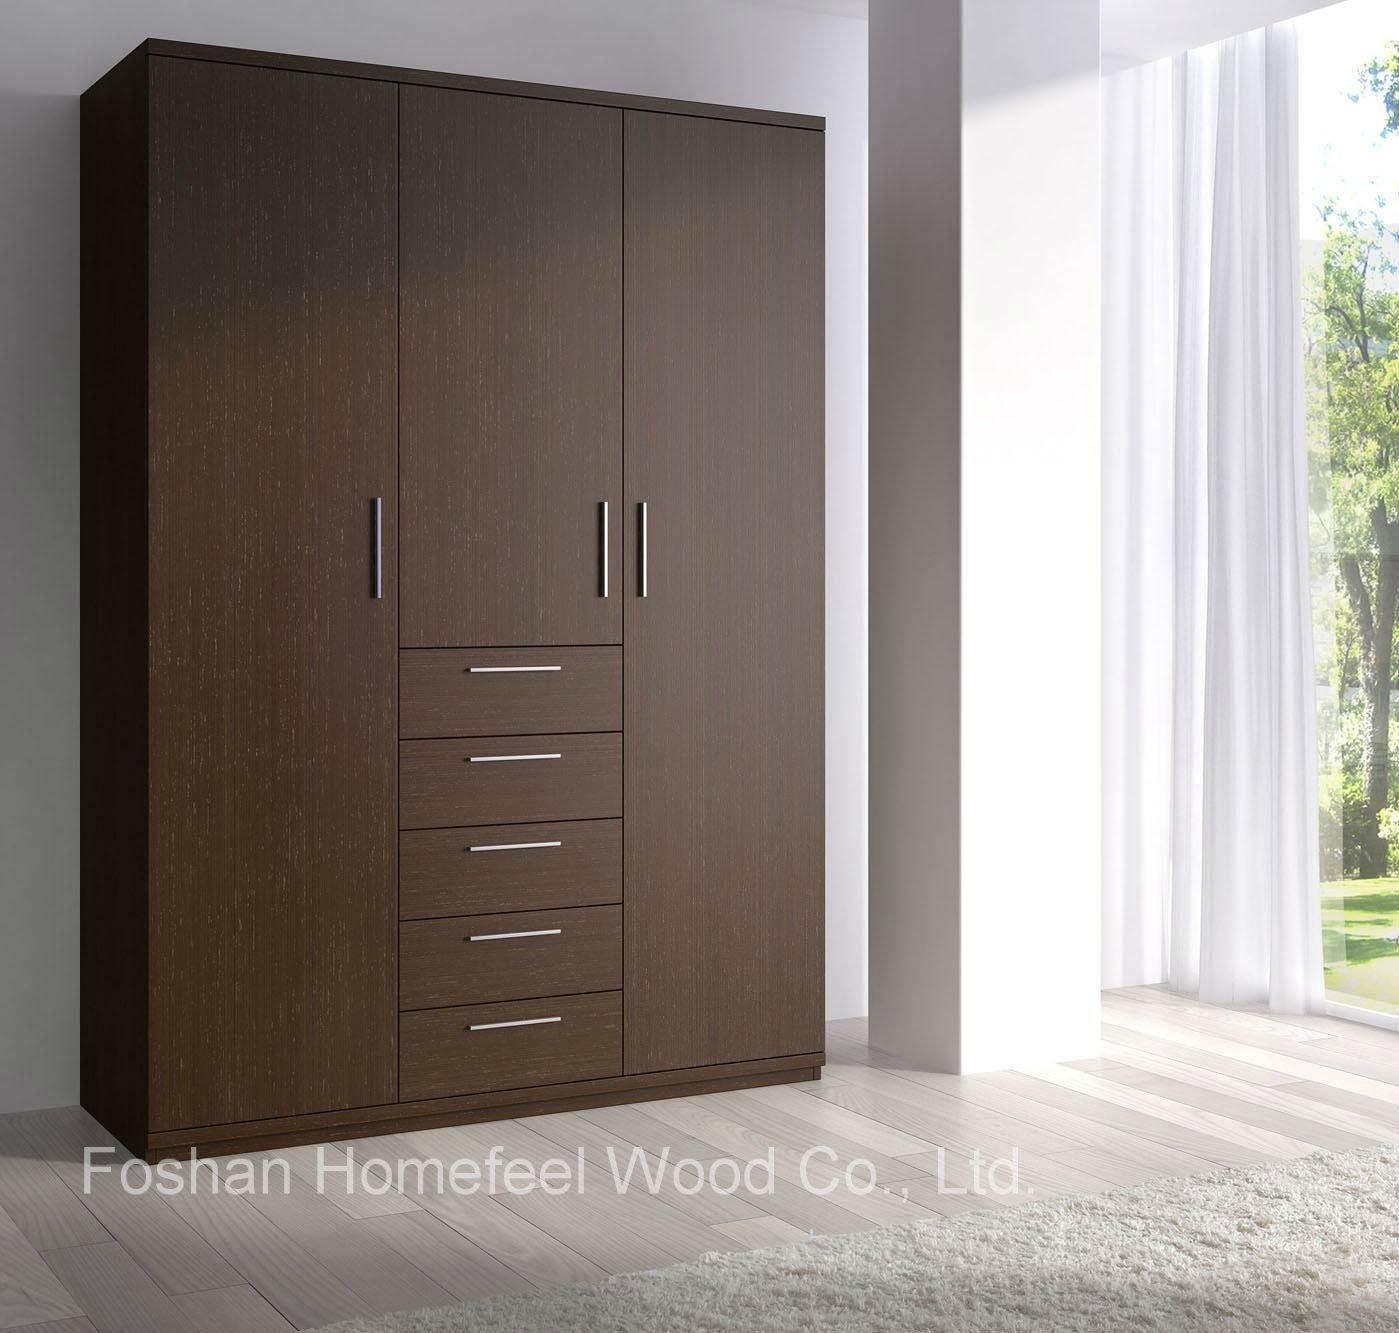 Wardrobe - Foshan Homefeel Wood Co., Ltd. - Page 5. in Dark Wardrobes (Image 26 of 30)